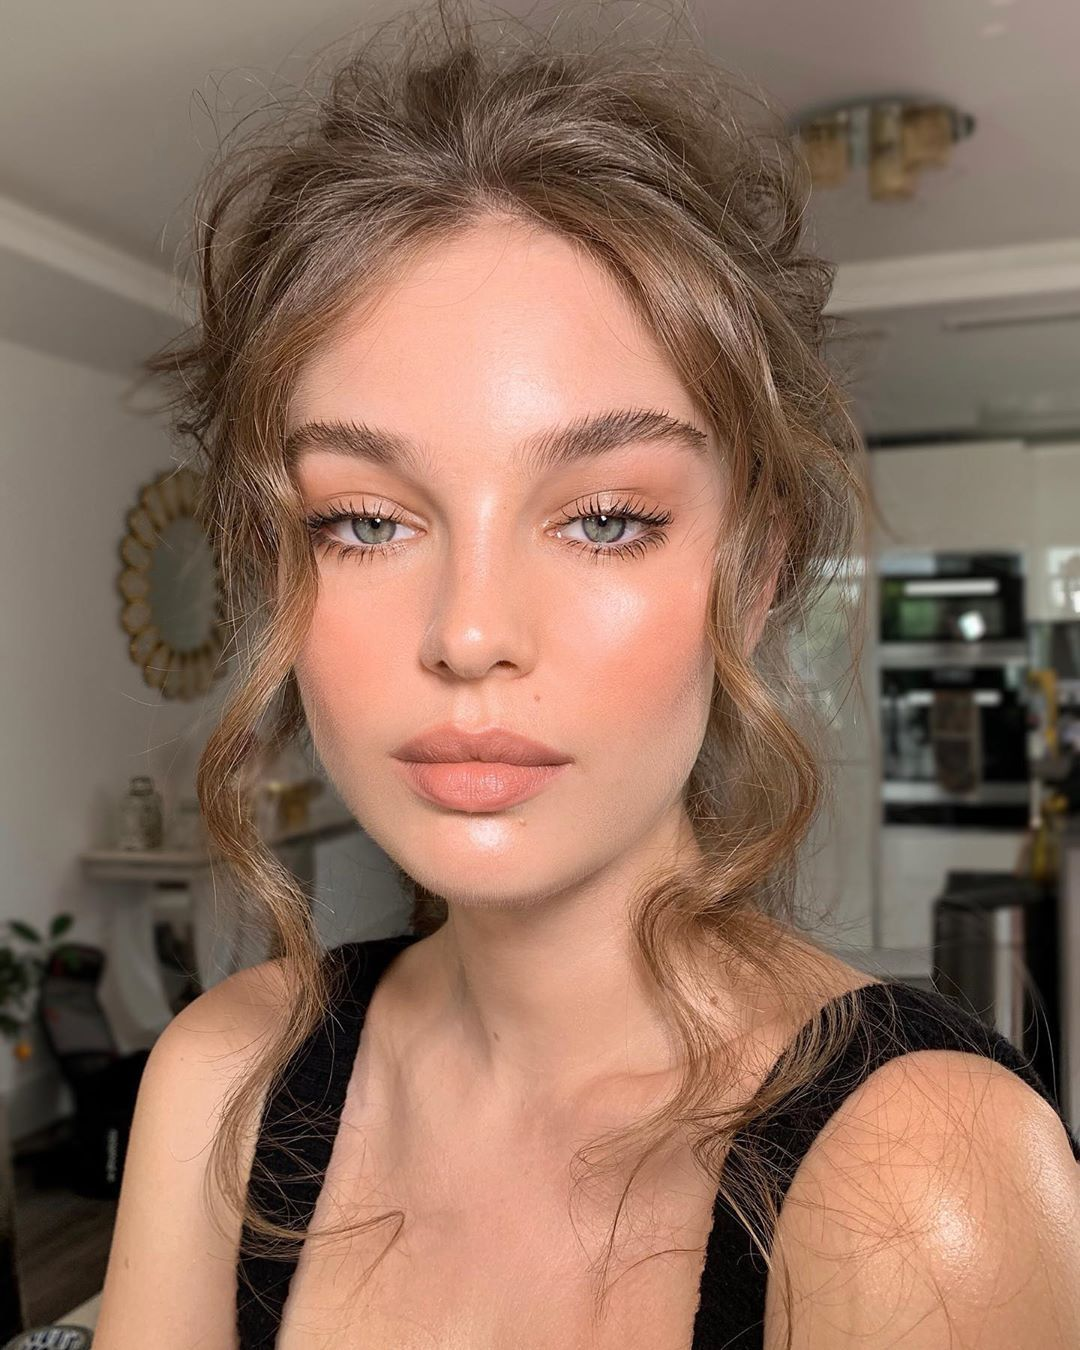 "Nikki_Makeup on Instagram: ""Caramel crème glow @millieroseloggie  Hair by @lukepluckrose #nikki_makeup"" #softglammakeup"